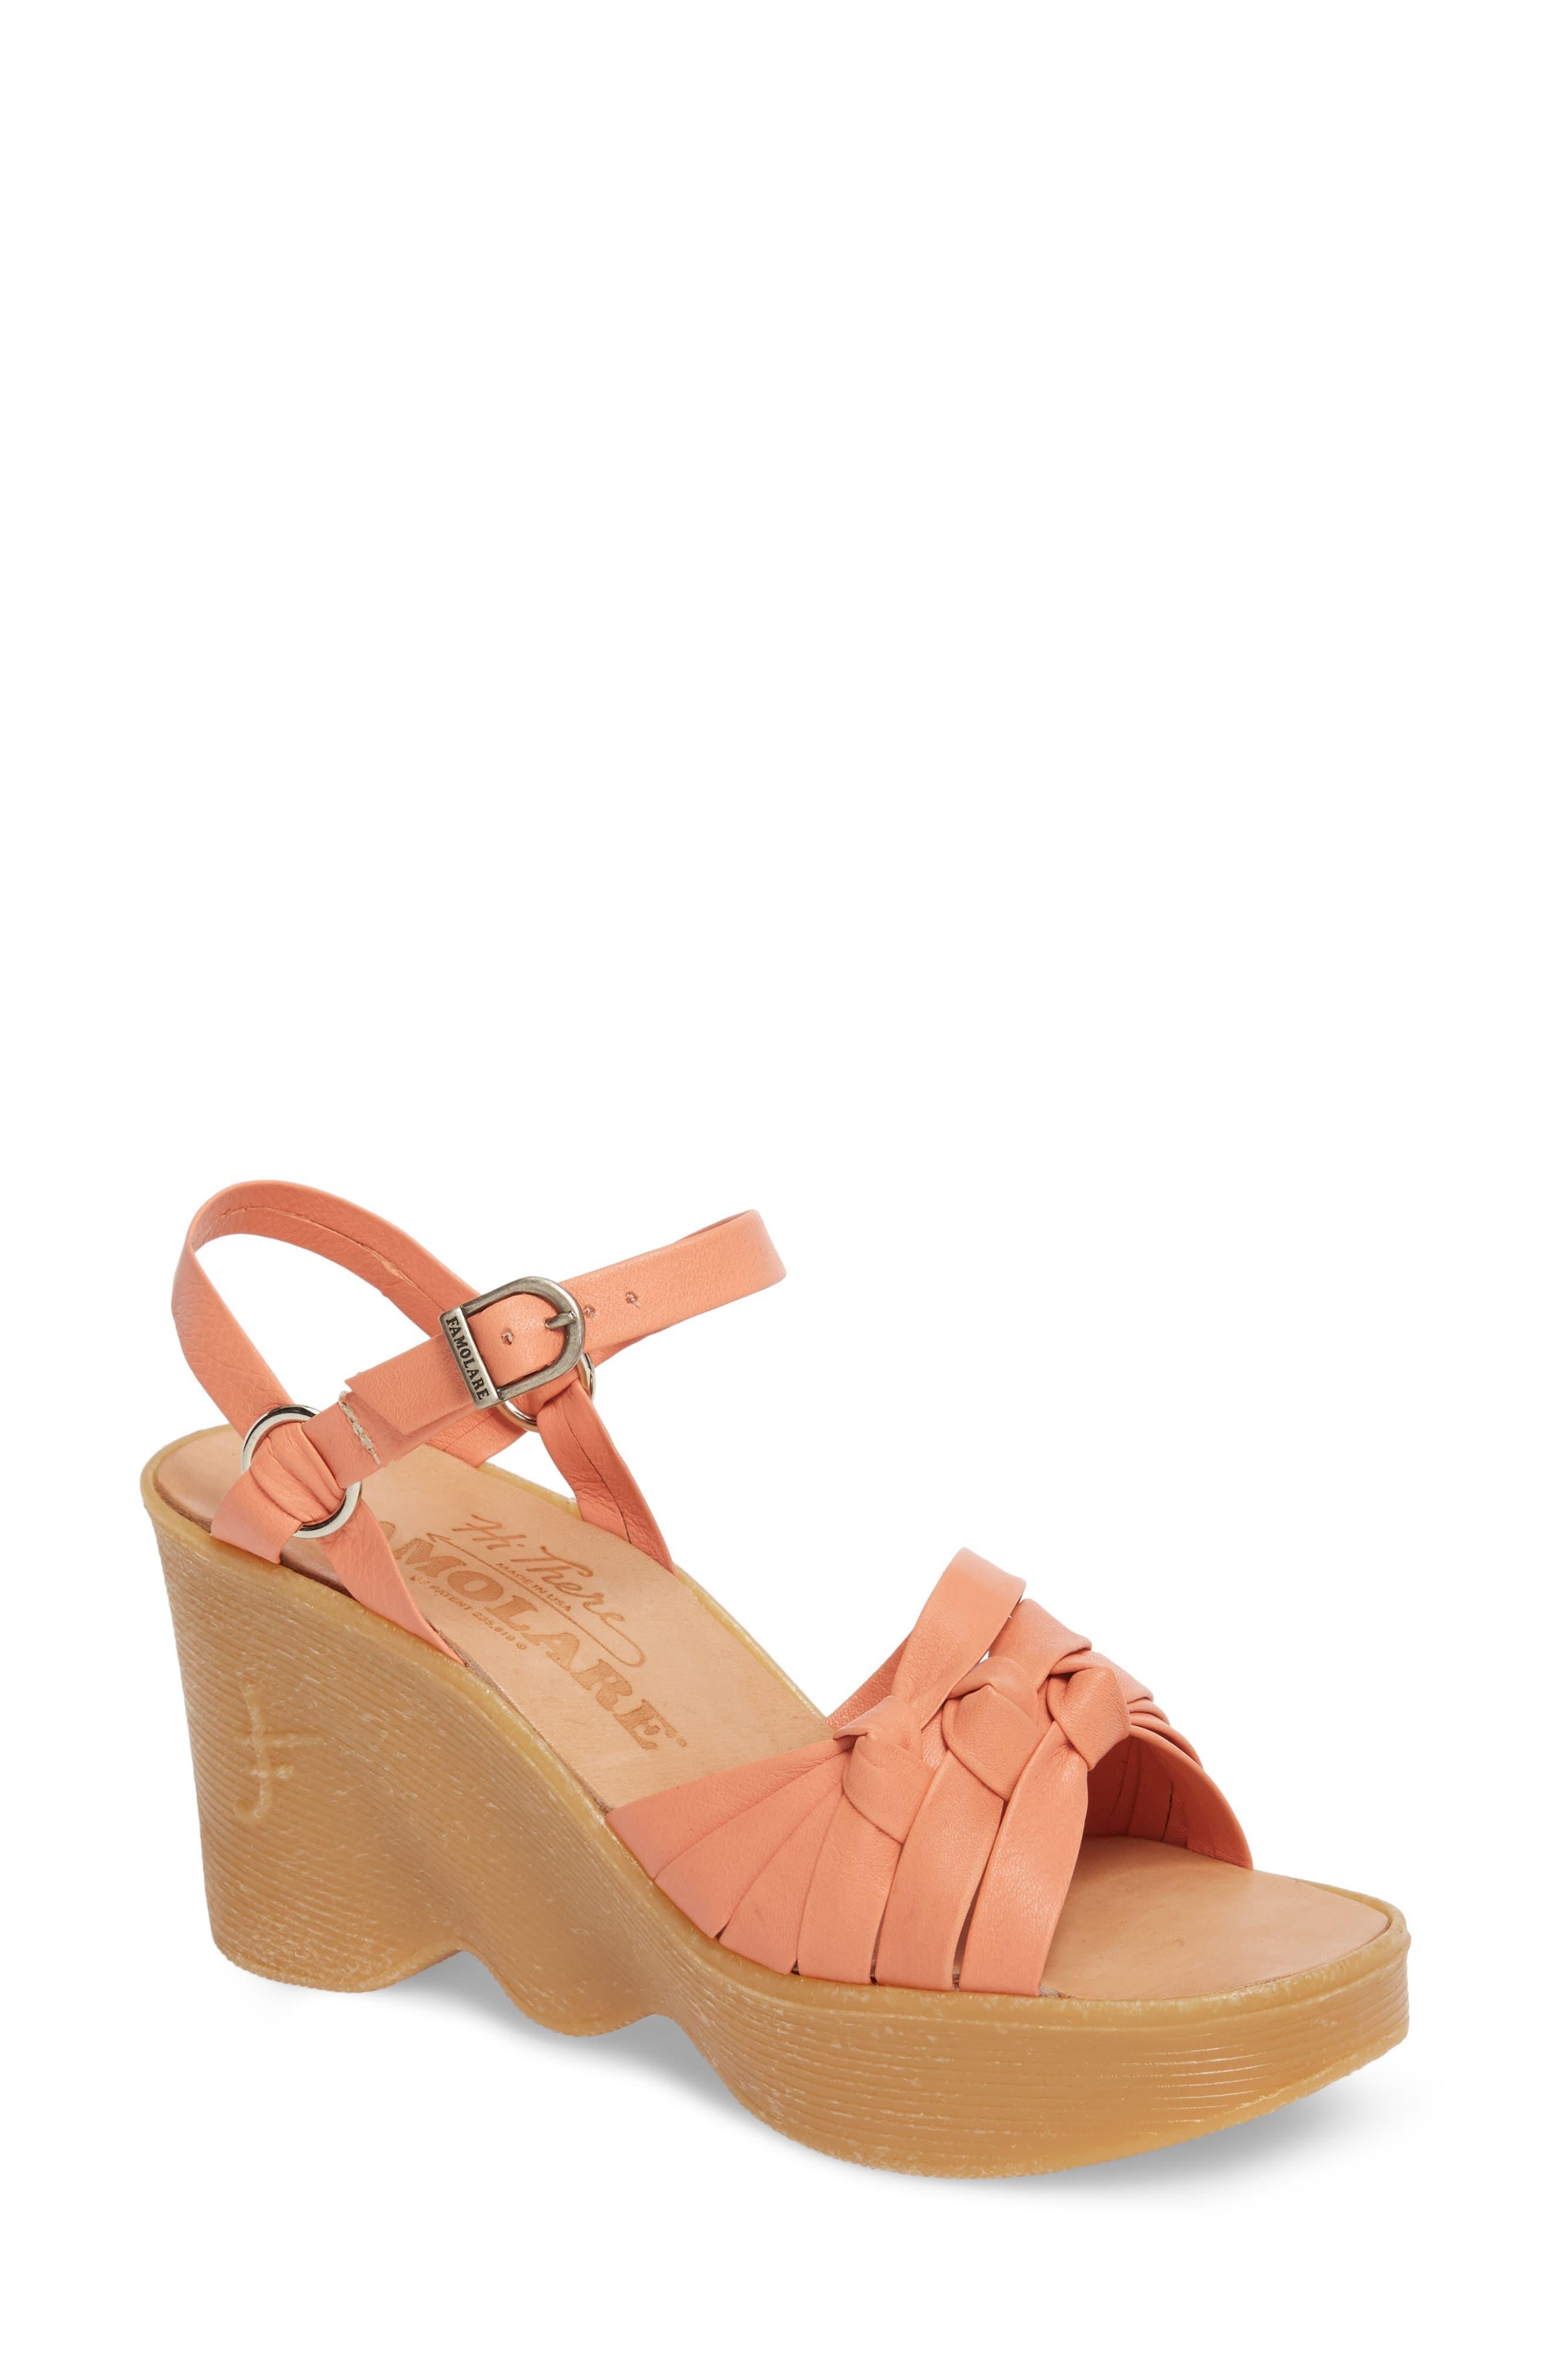 Main Image - Famolare Knot So Fast Wedge Sandal (Women)